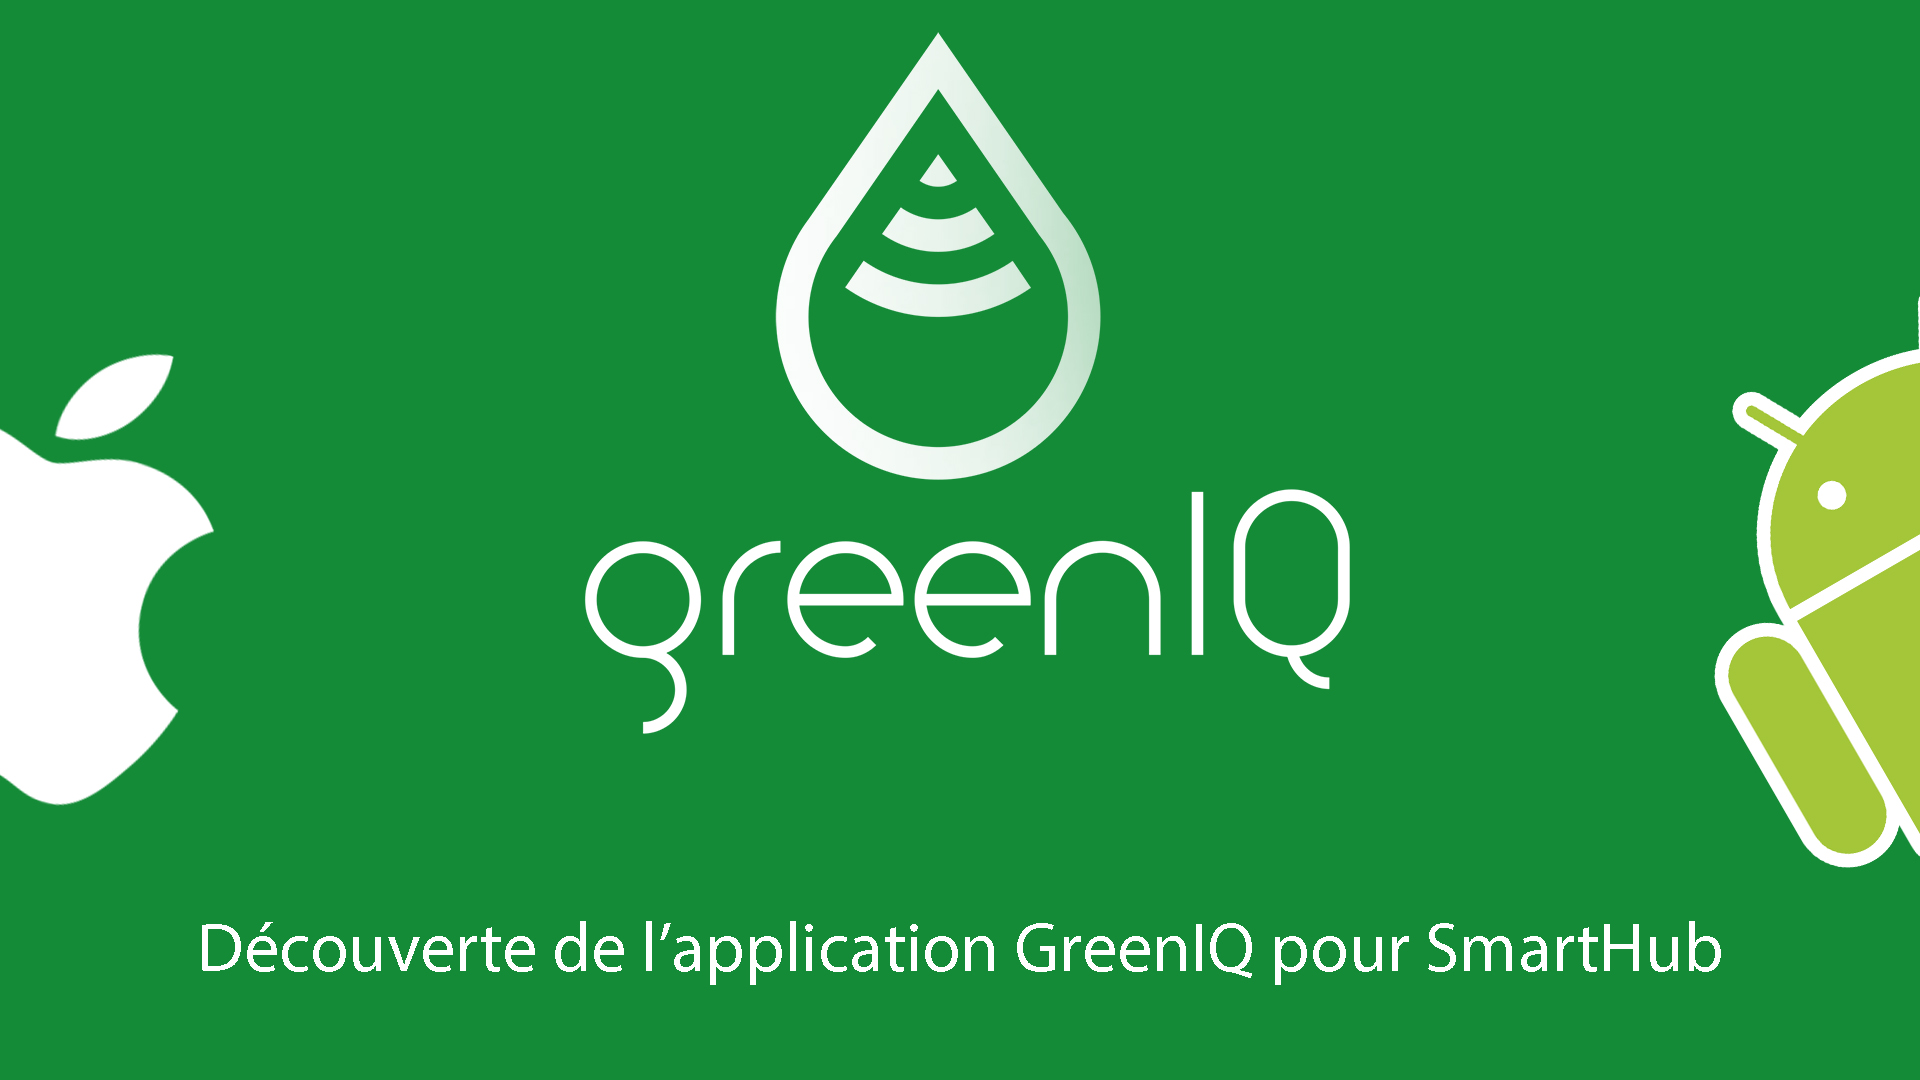 L'application GreenIQ pour SmartHub Gen 2 et 3